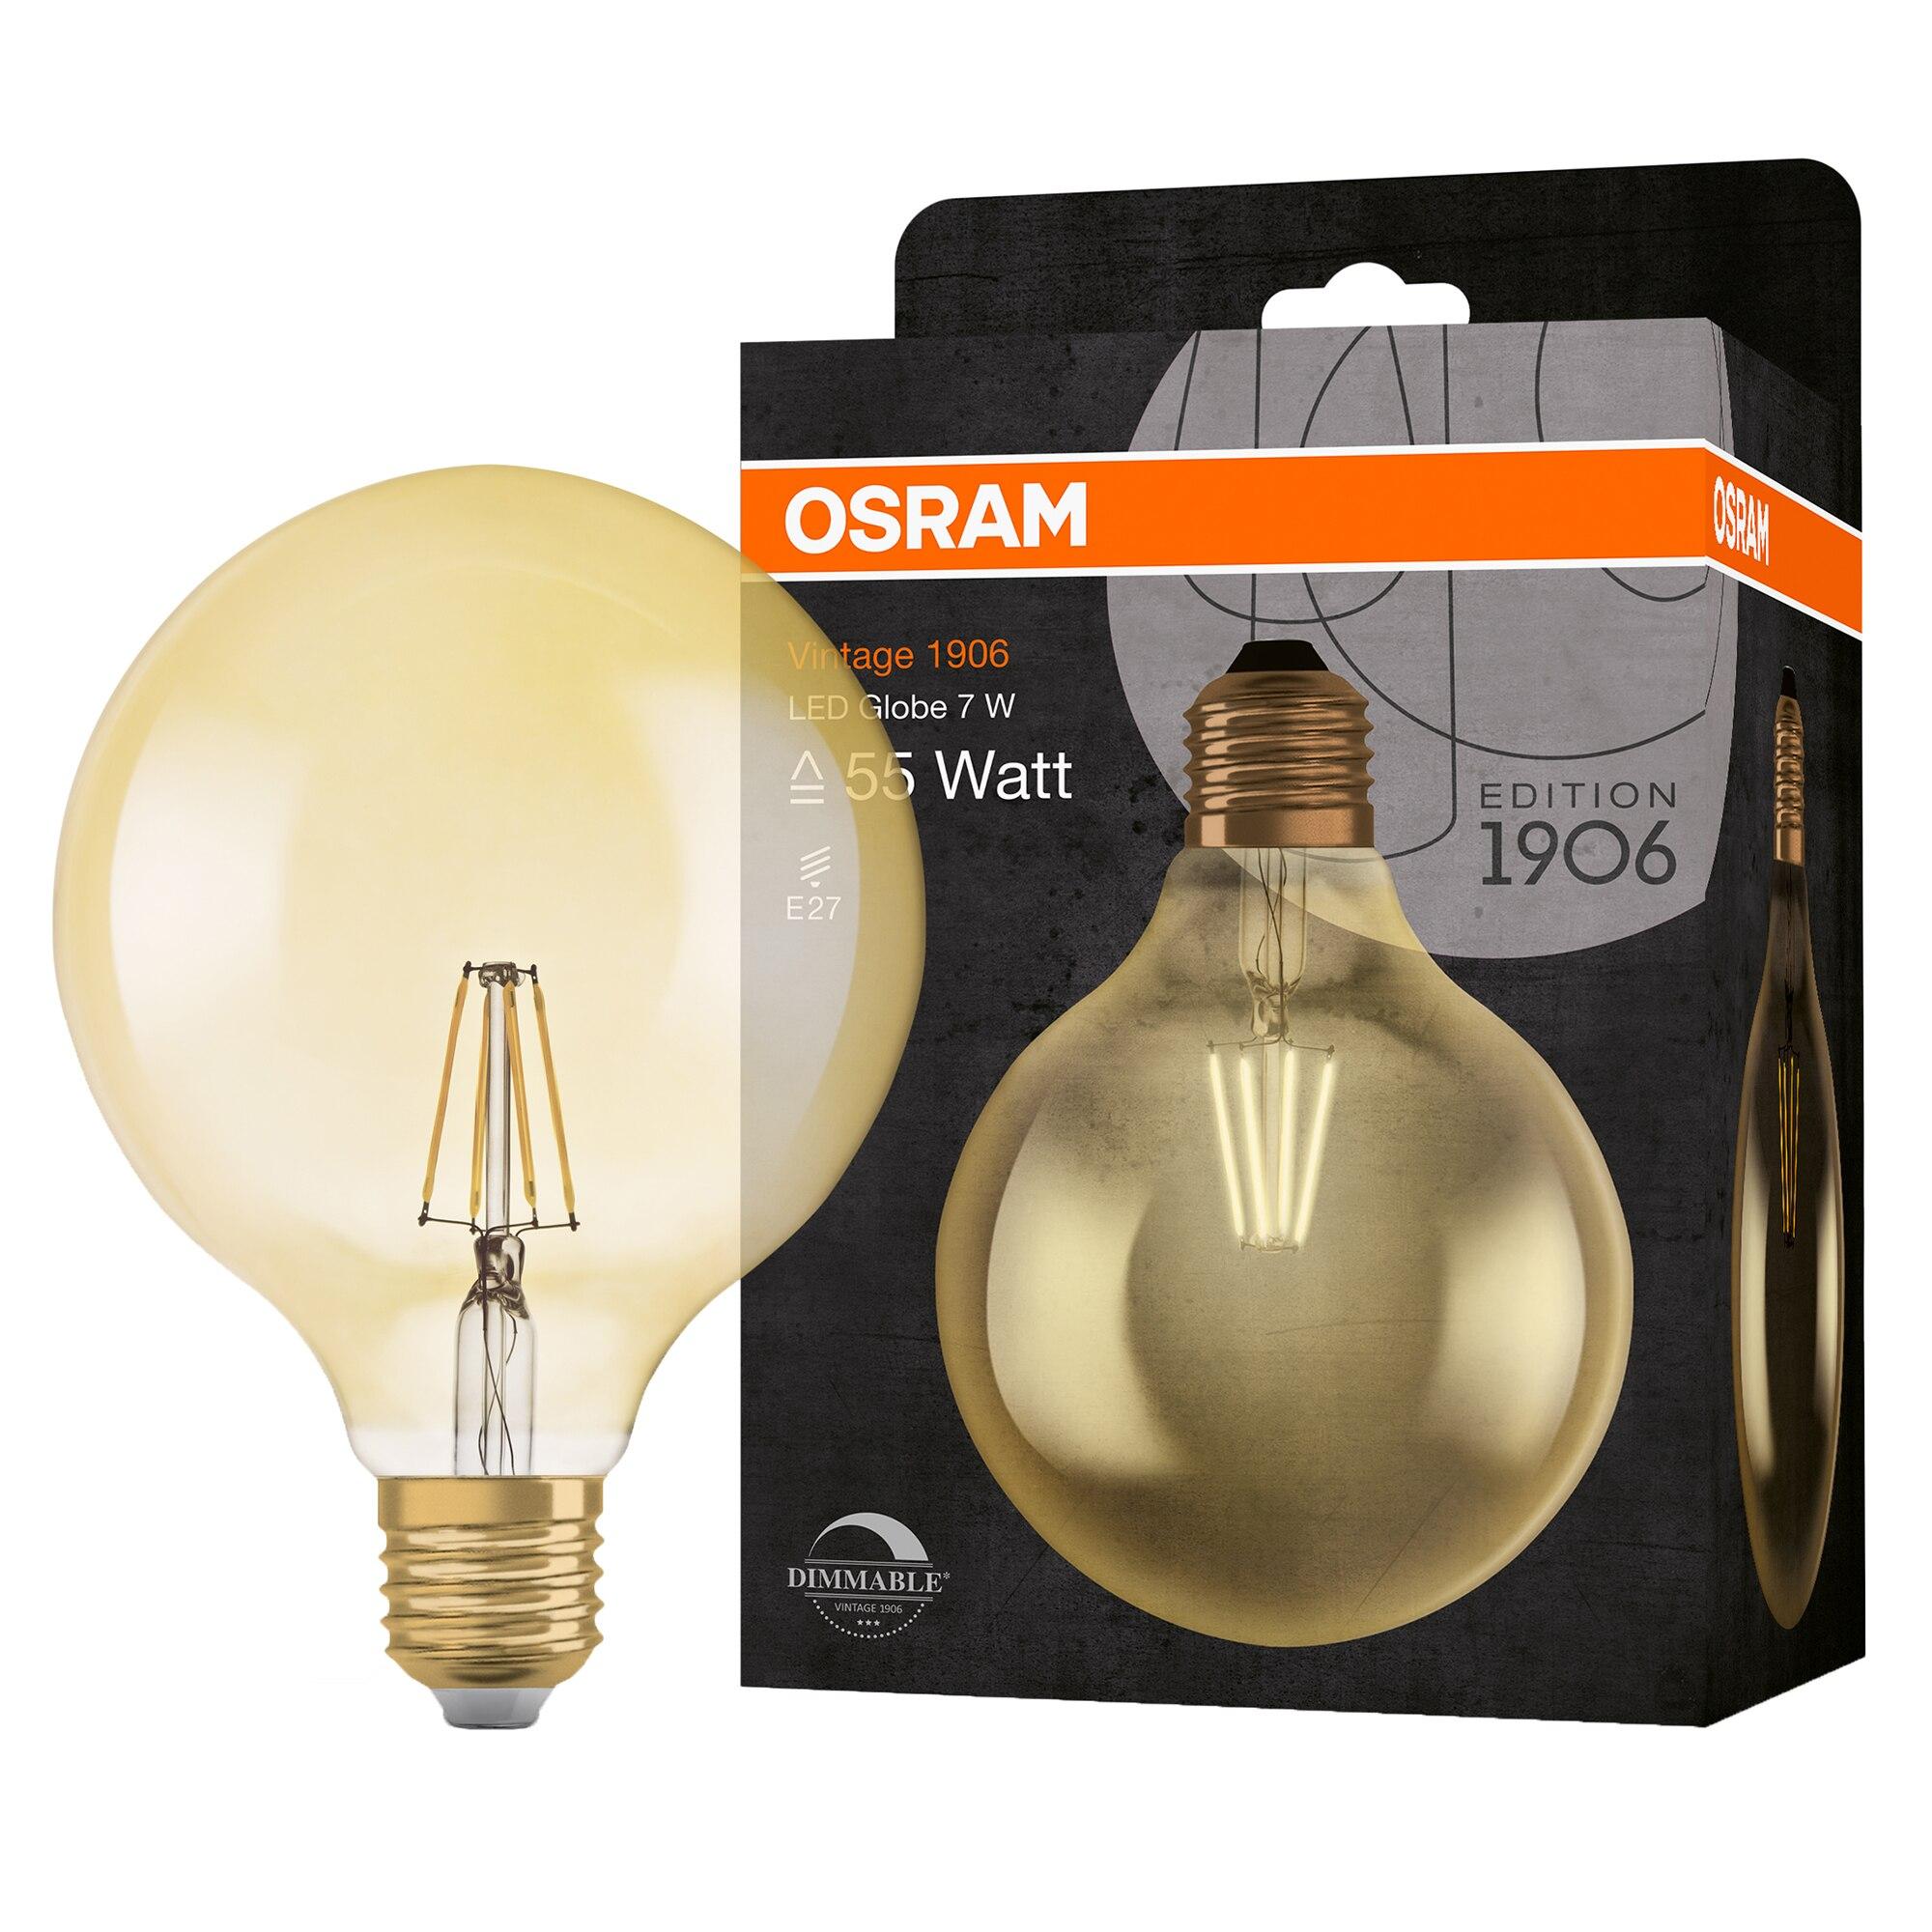 Fotografie Bec LED Osram Vintage 1906 Globe, dimabil, 55, 7 W, E27, lumina calda 2500K, 725 lm, clasa energetica A+, 15 000 ore functionare